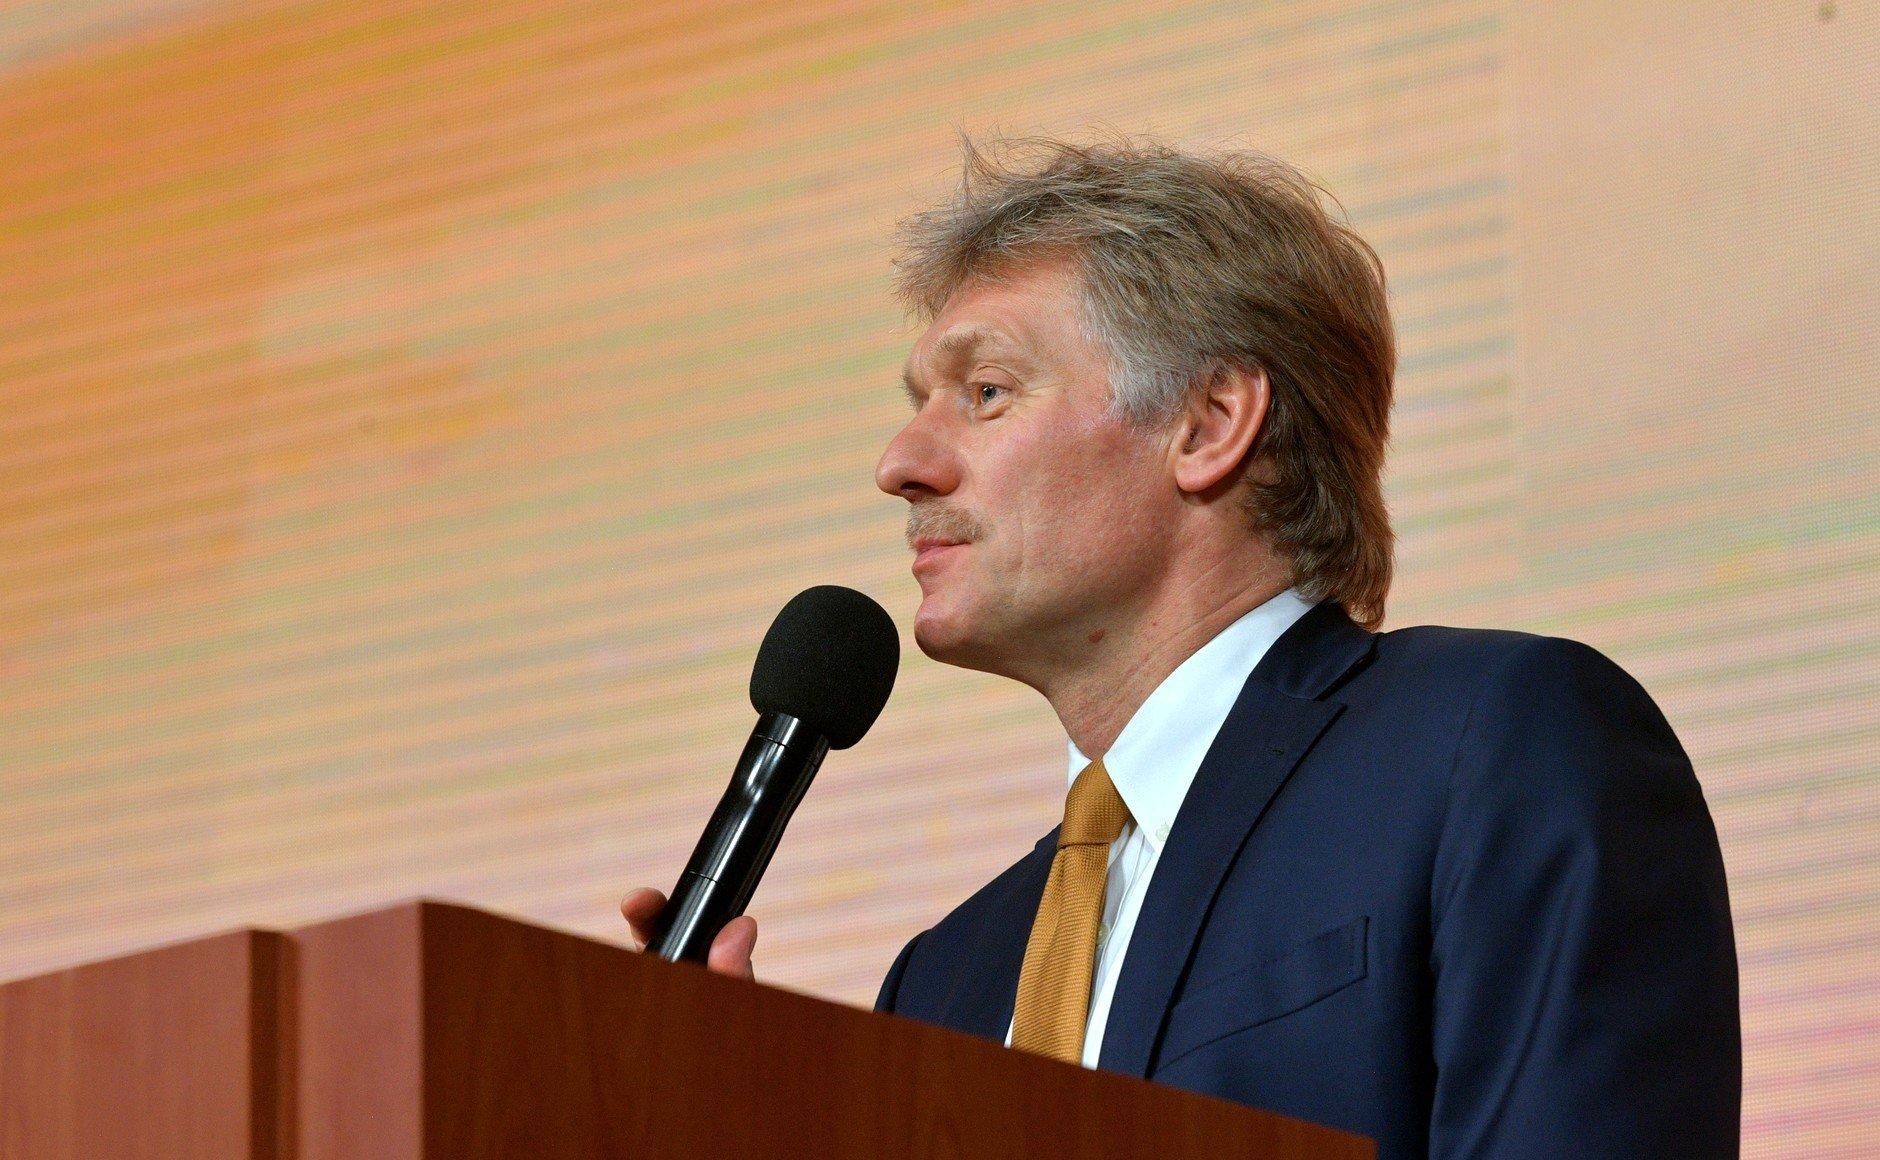 ВКремле поведали опрогрессе подготовки антисанкций